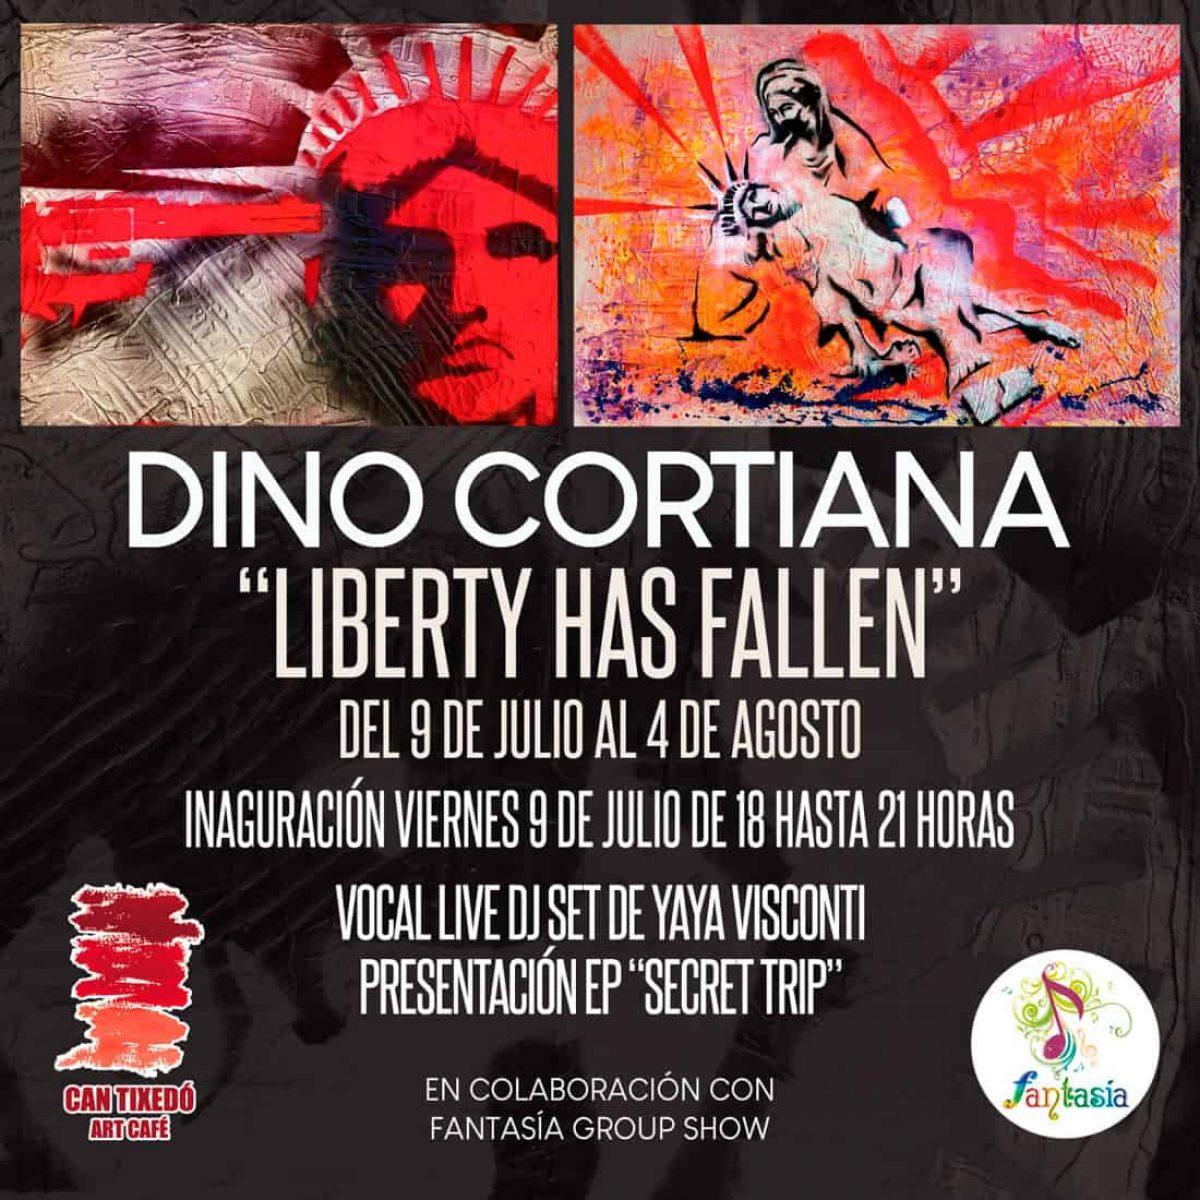 exhibition-dino-cortiana-can-tixedo-ibiza-2021-welcometoibiza